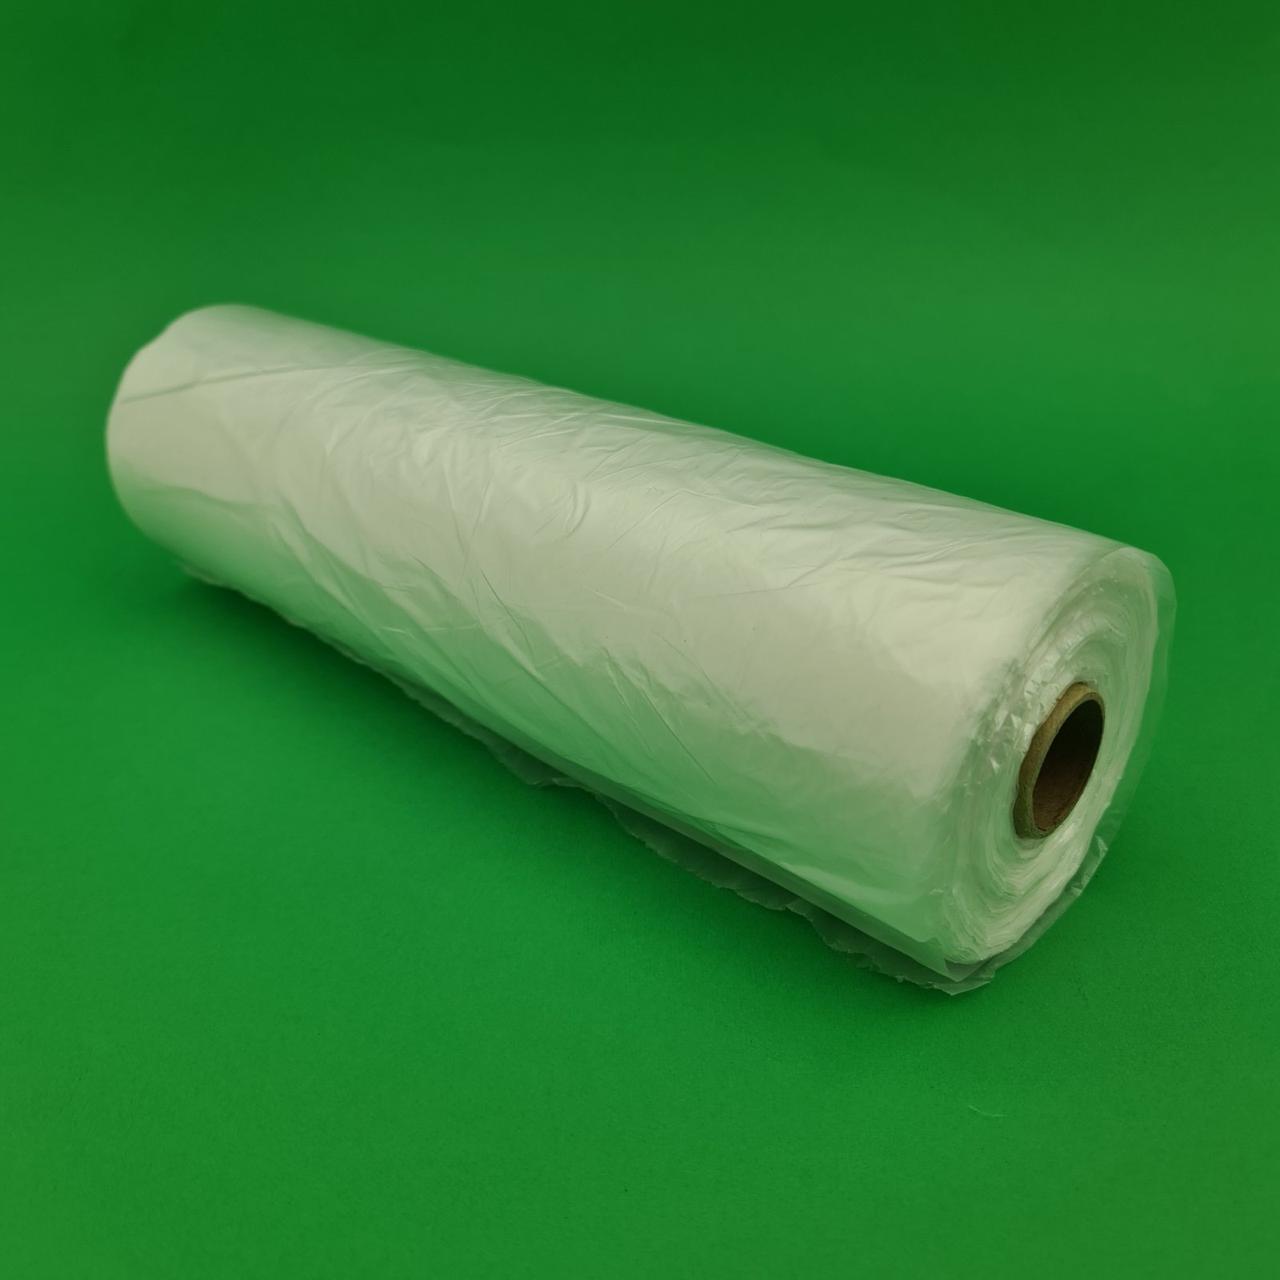 Фасовочный пакет рулон 26х40 (по 700шт) Исток (1 рул)